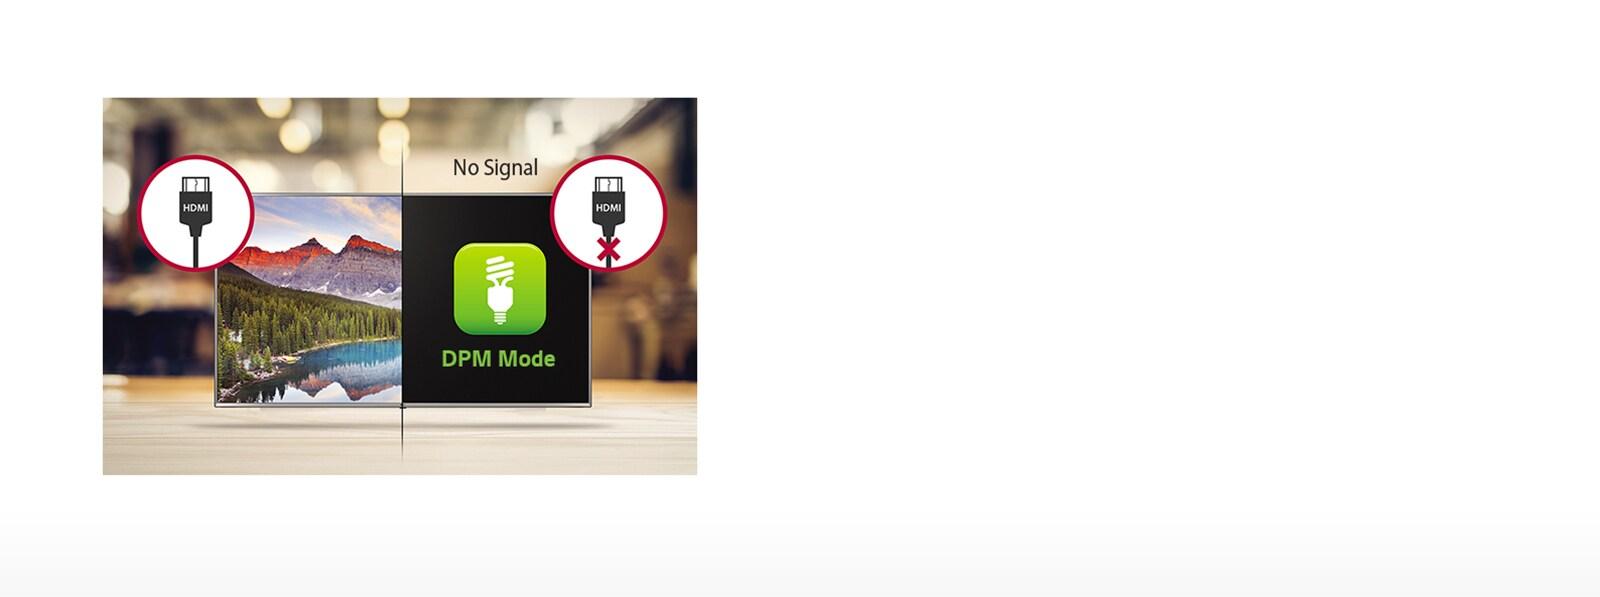 75UU640C_Commercial_Lite_D09_07_DPM-(Display-Power-Management)_1534145055756